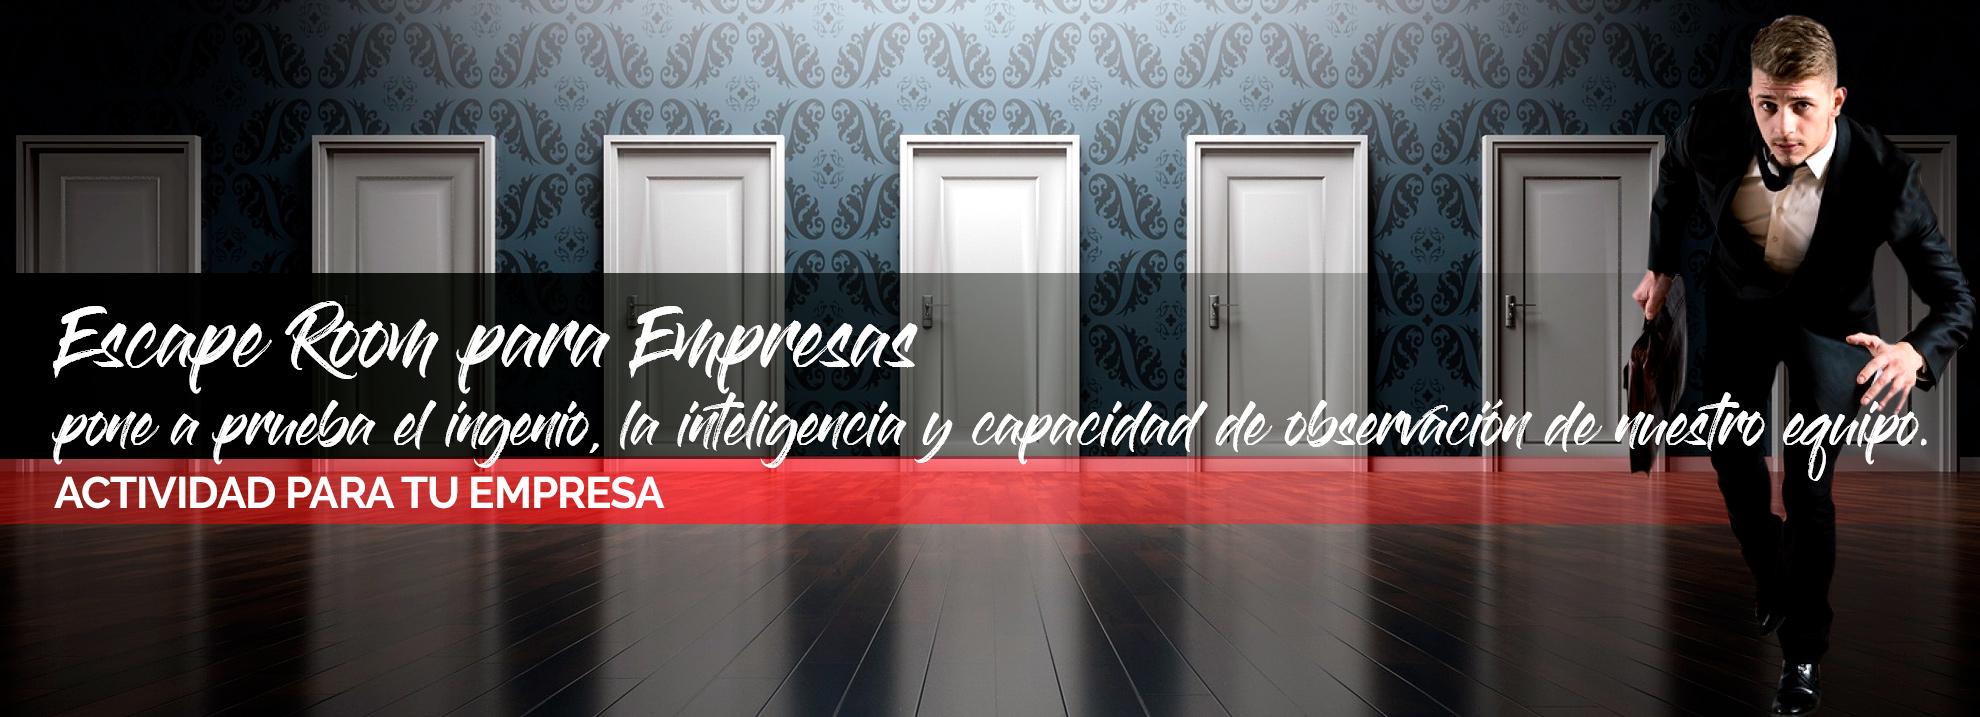 Escape room para empresas